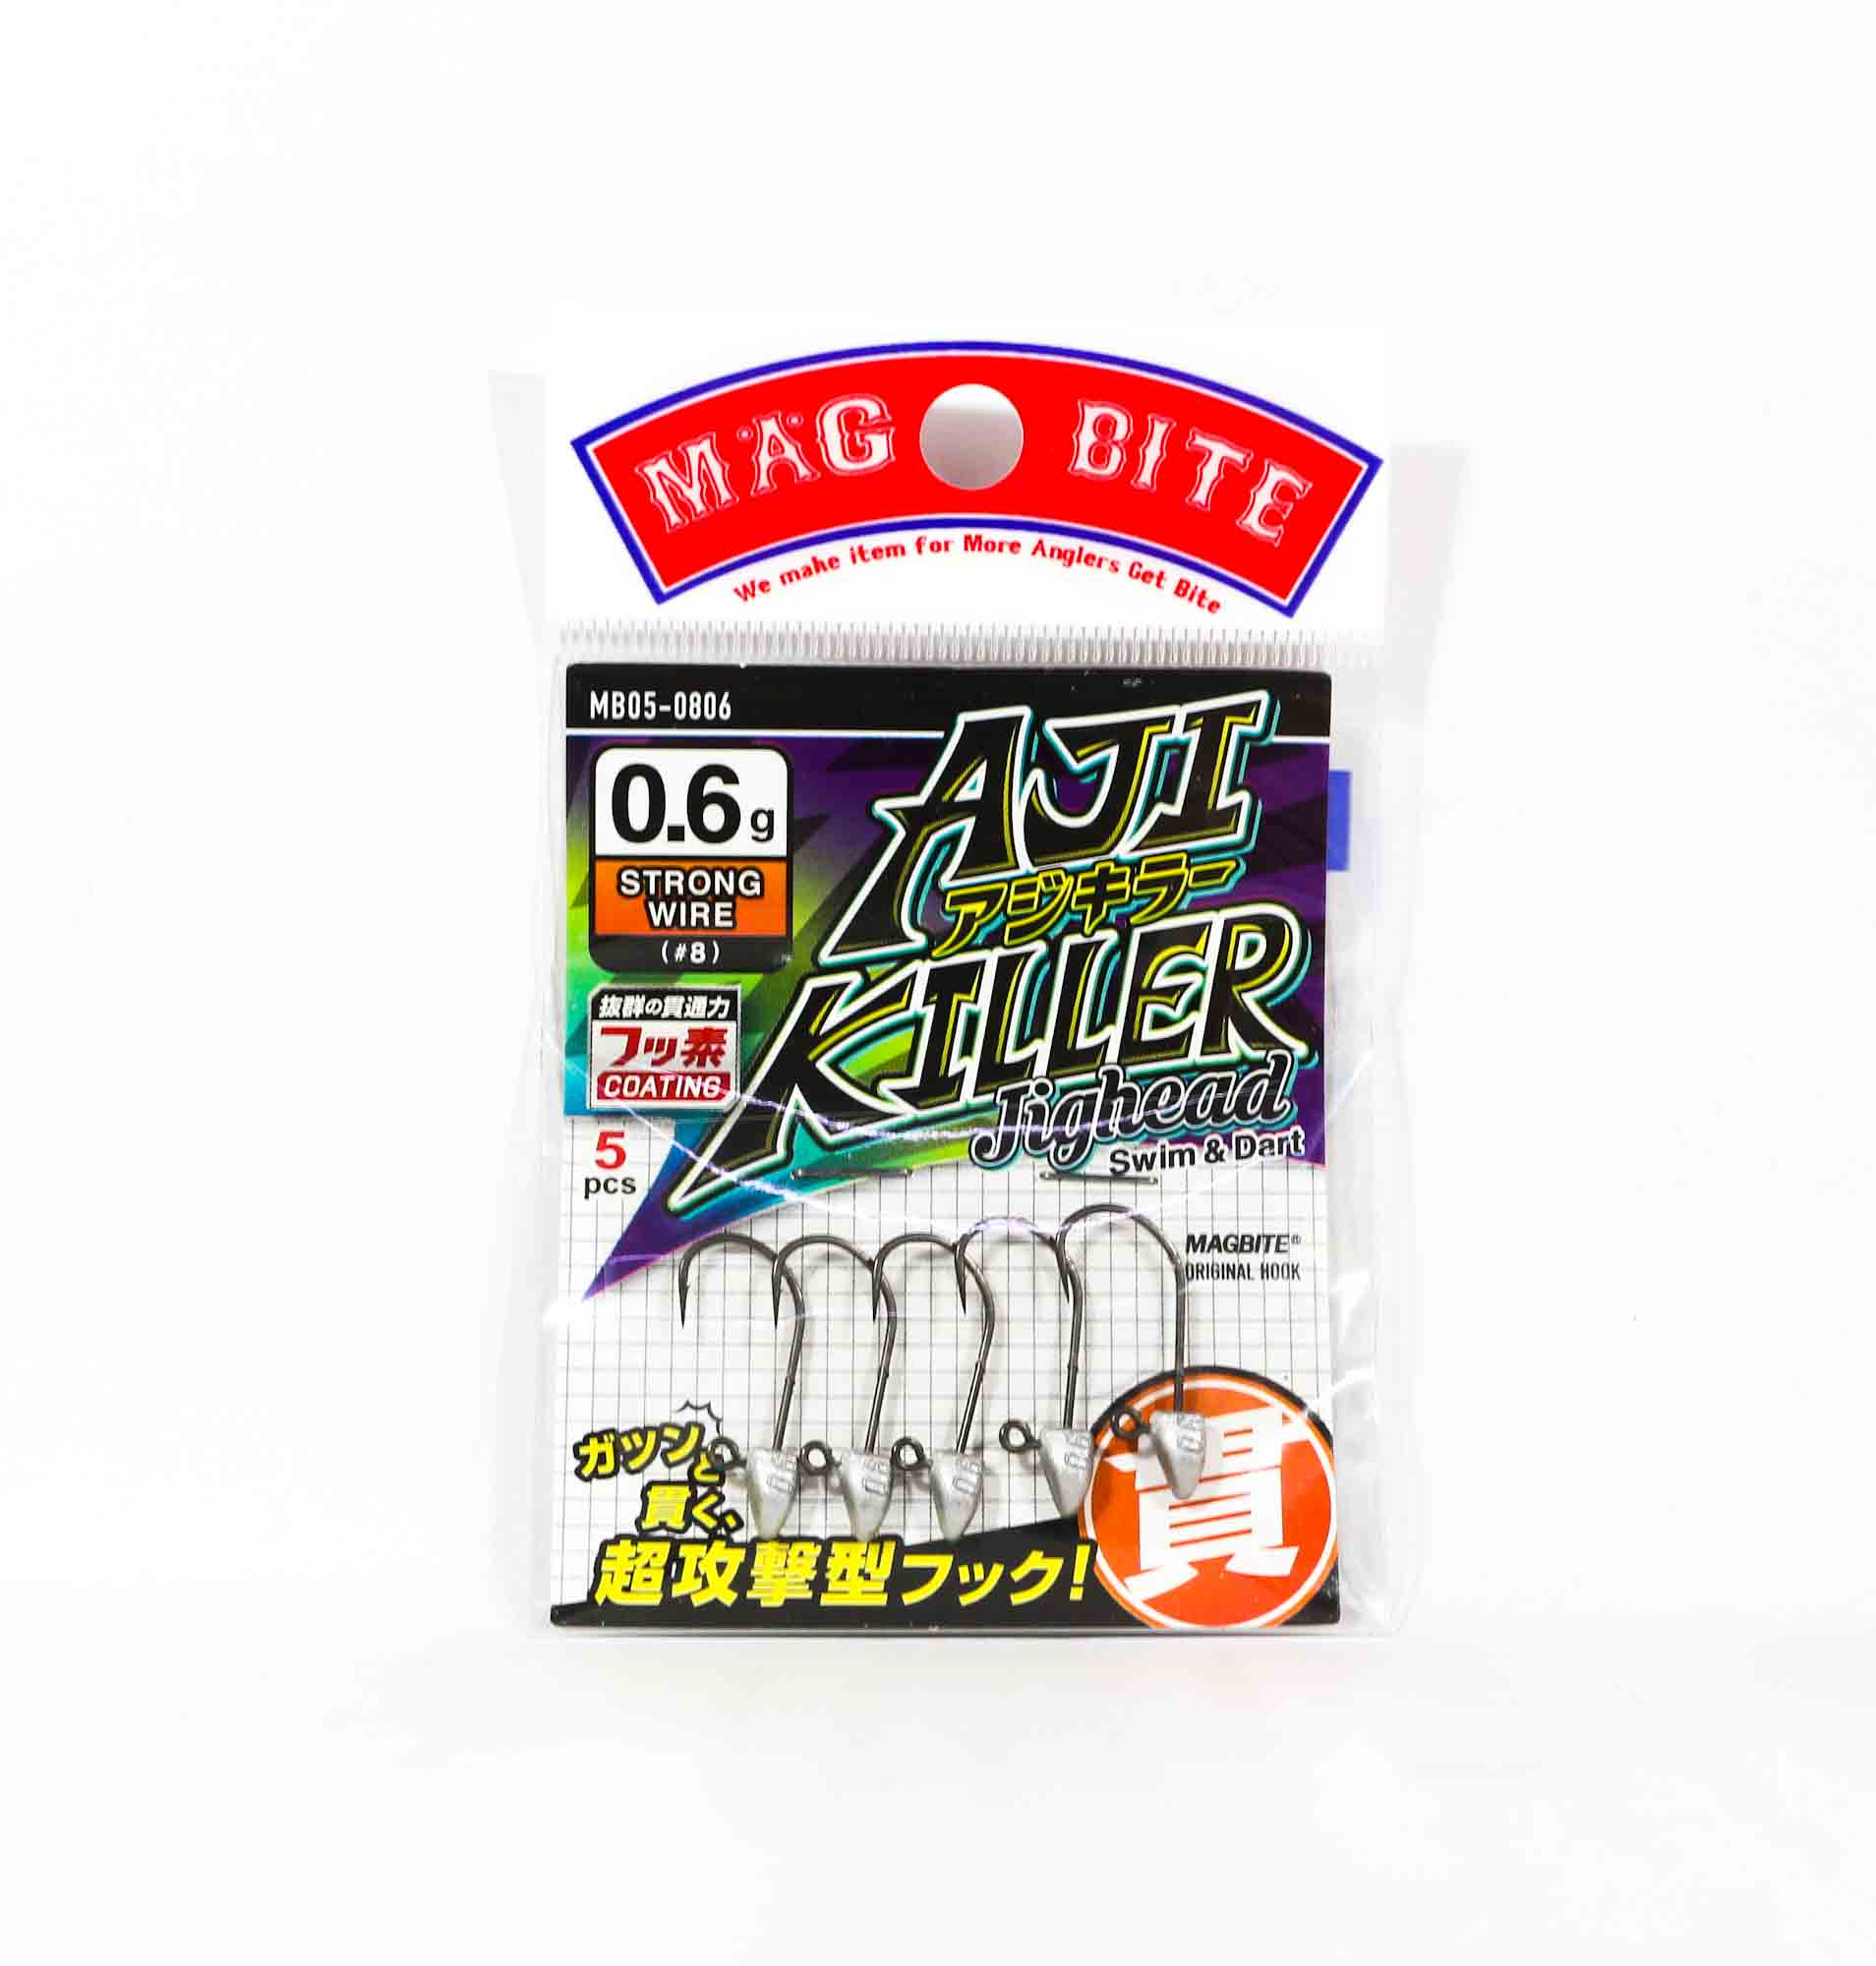 Harimitsu Mag bite Jighead Aji Killer 0.6 grams size 8 (5983)